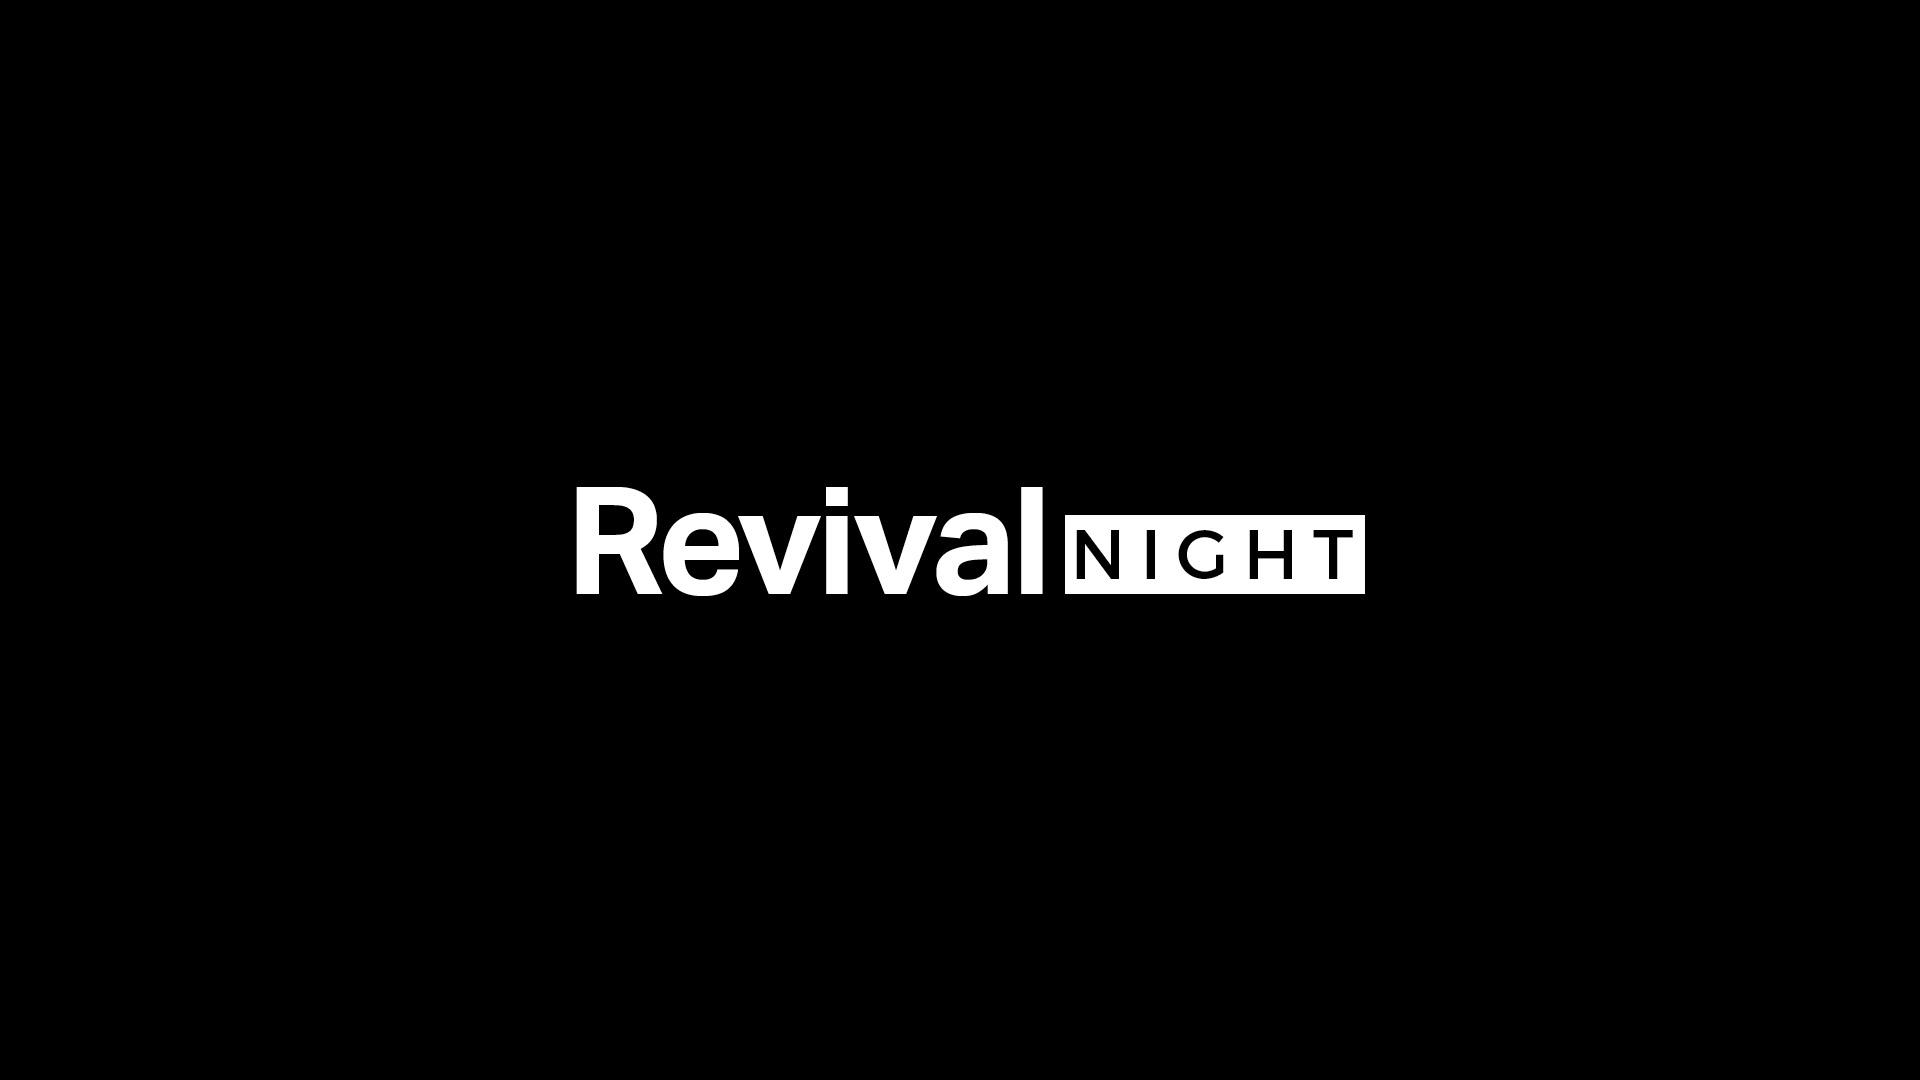 RevivalNight-1920x1080.jpg